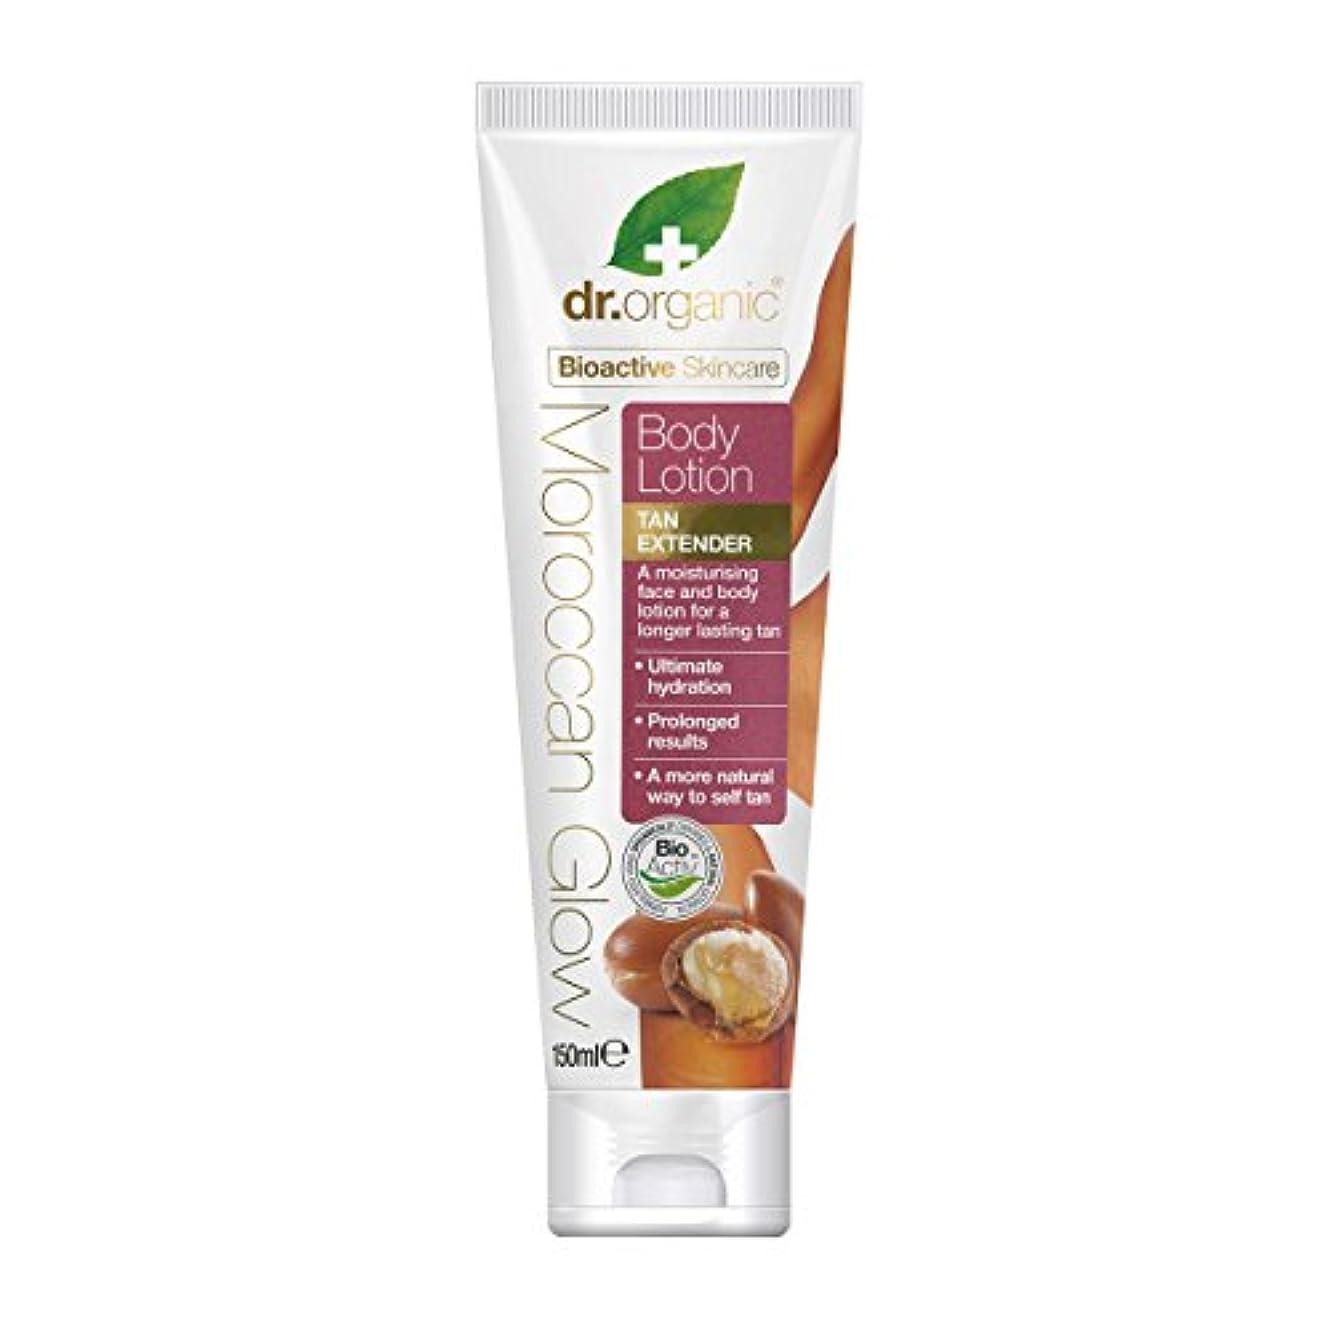 Dr.organic Organic Moroccan Oil Body Lotion Tan Extender 150ml [並行輸入品]